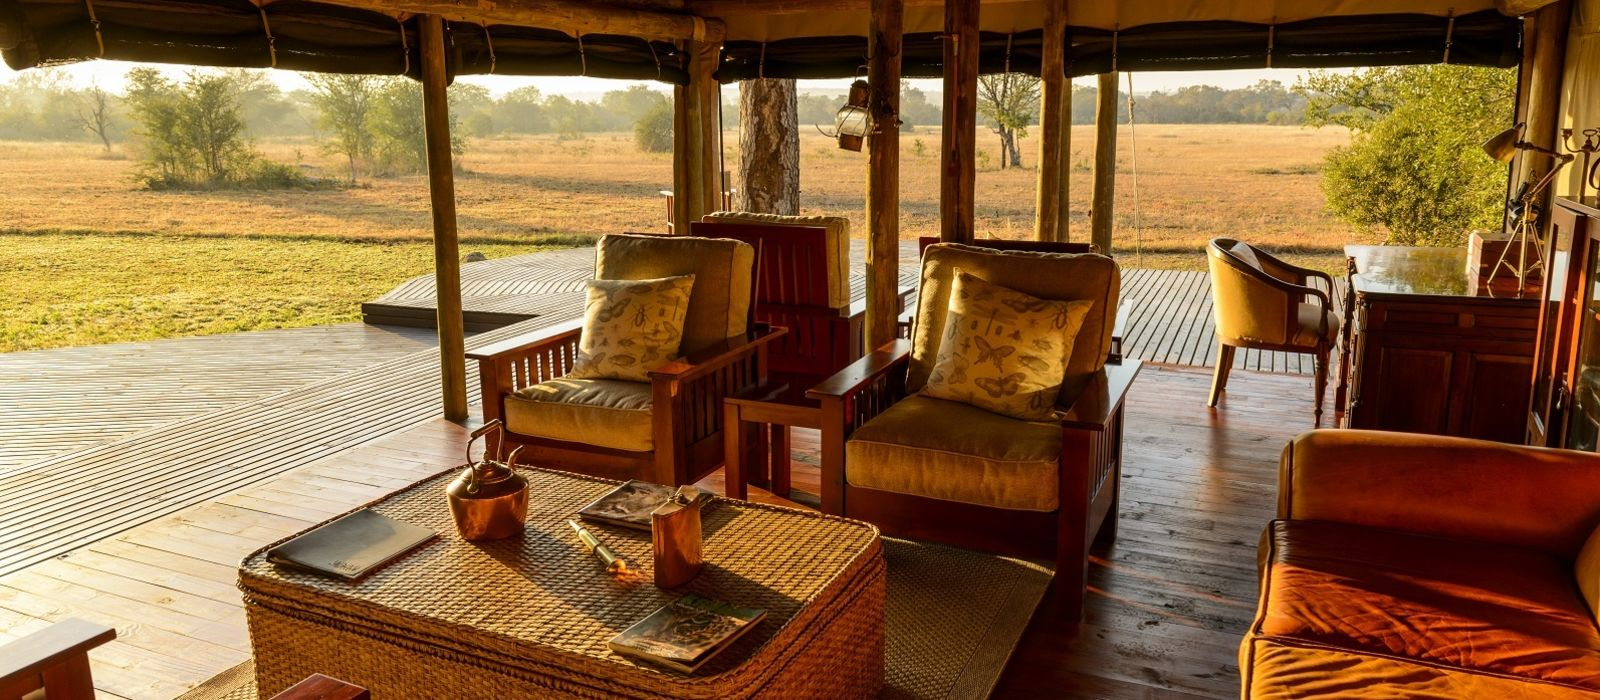 Hotel Rhino Safari Camp Zimbabwe